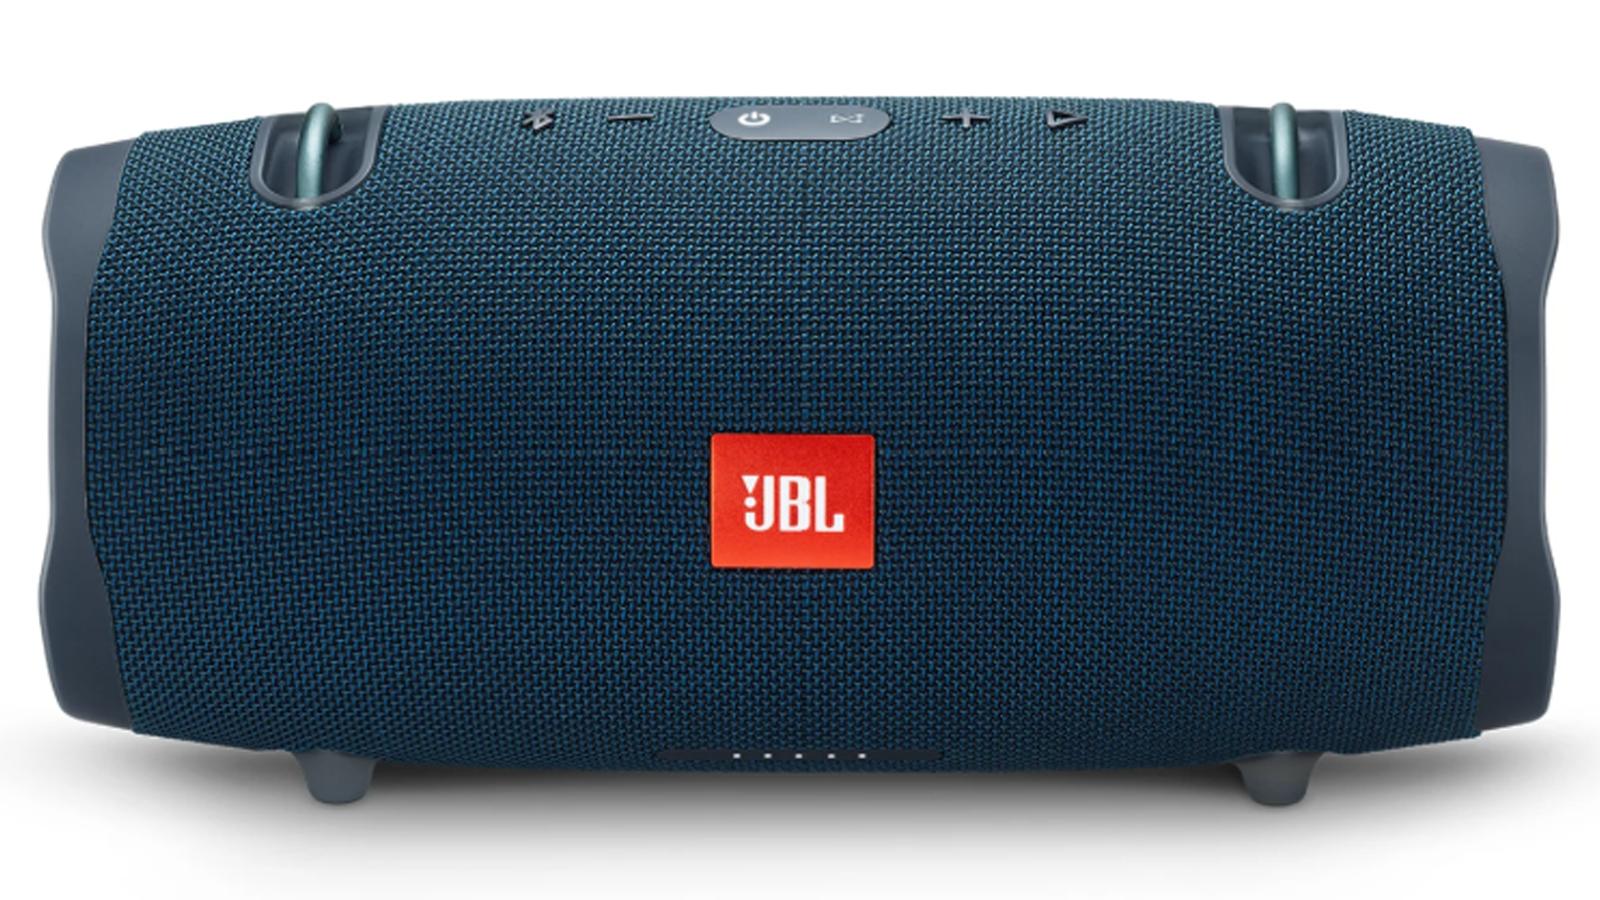 JBL Xtreme 2 best premium portable bluetooth speaker 2020